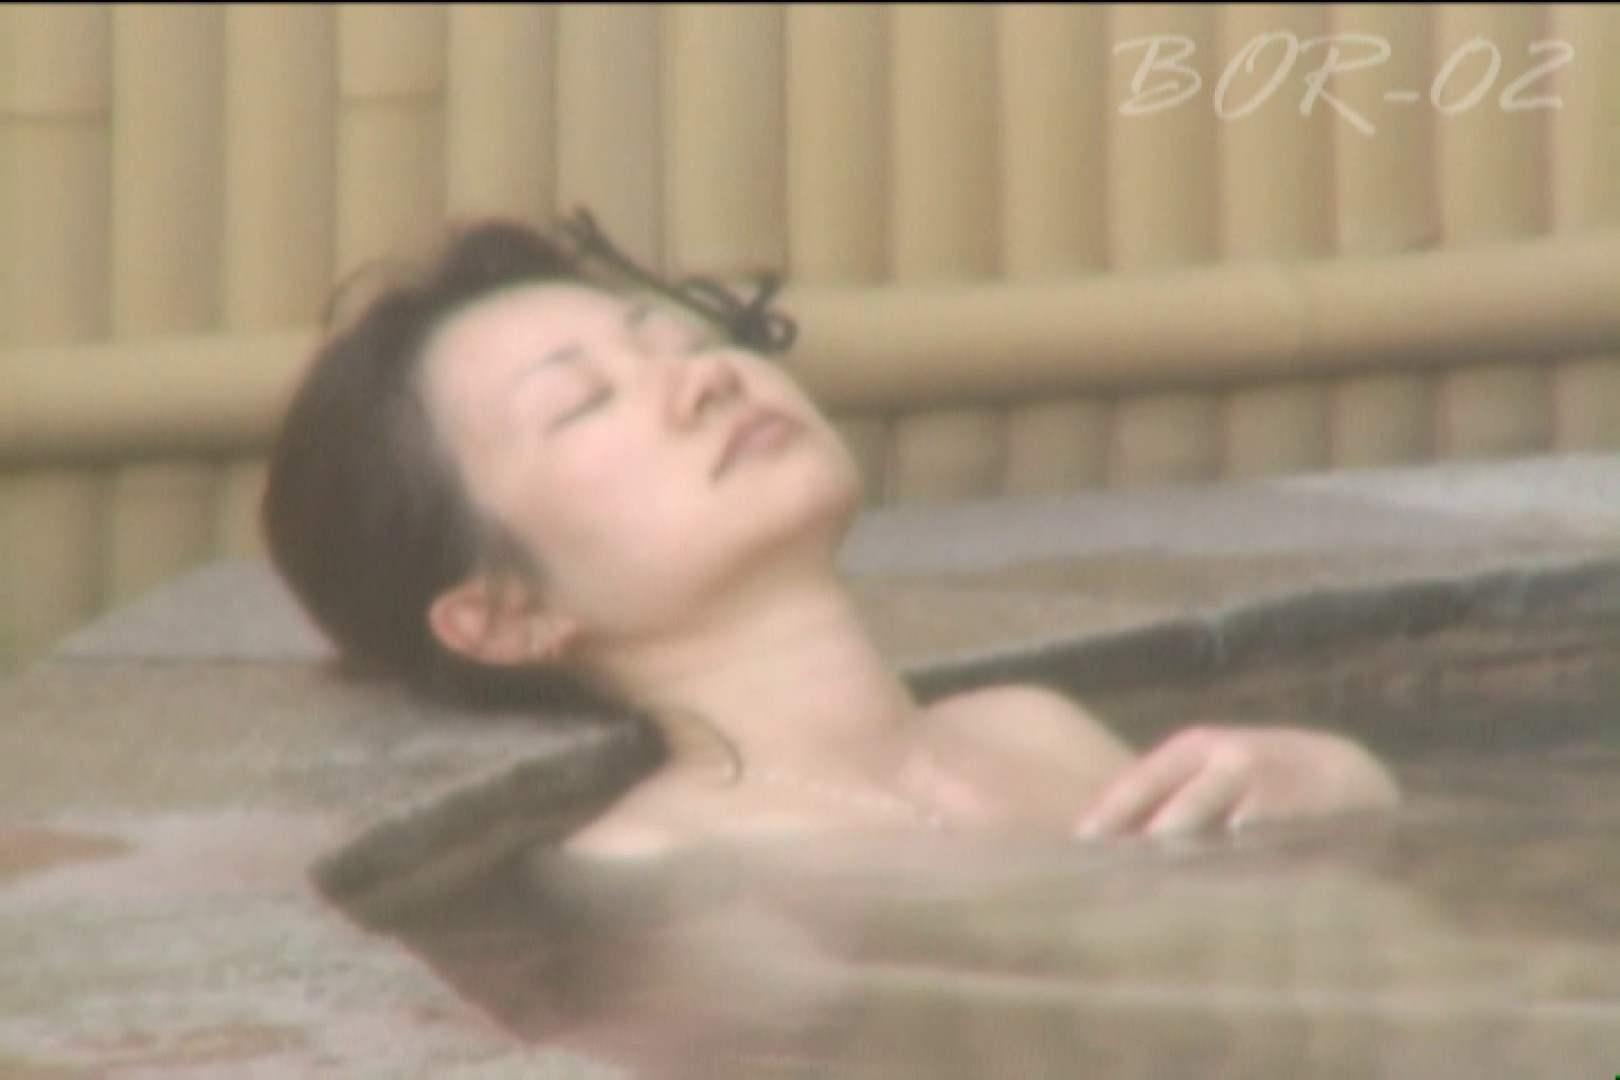 Aquaな露天風呂Vol.477 OLのプライベート  13pic 9